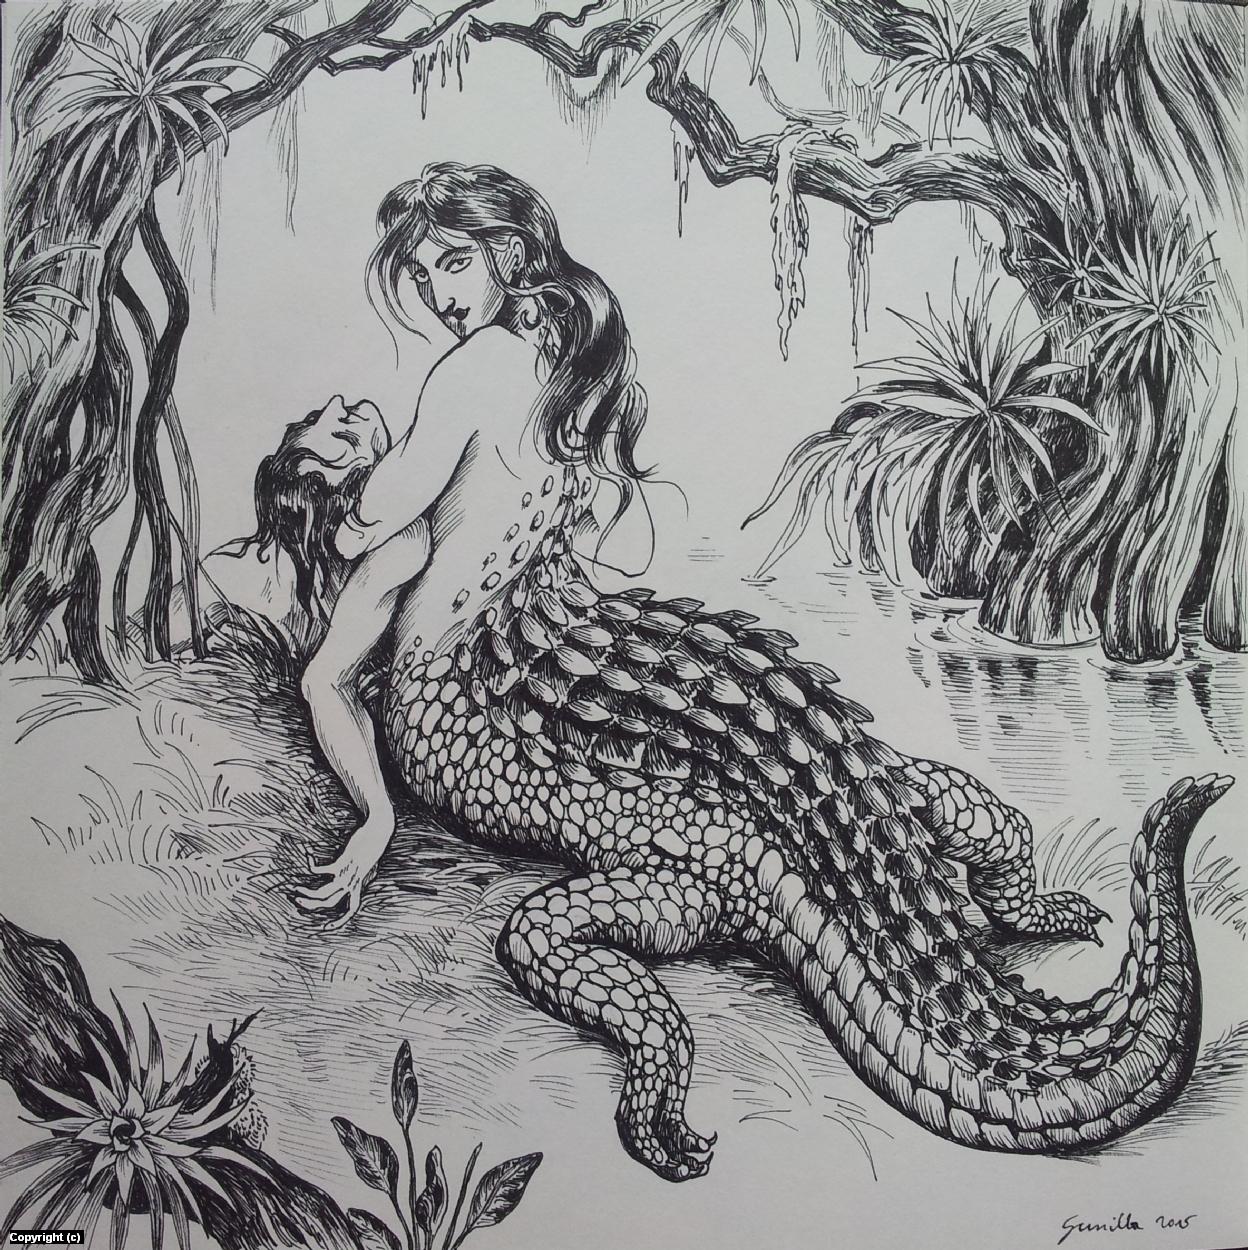 Alligator Girl Artwork by Gunilla Kral-Drofenik